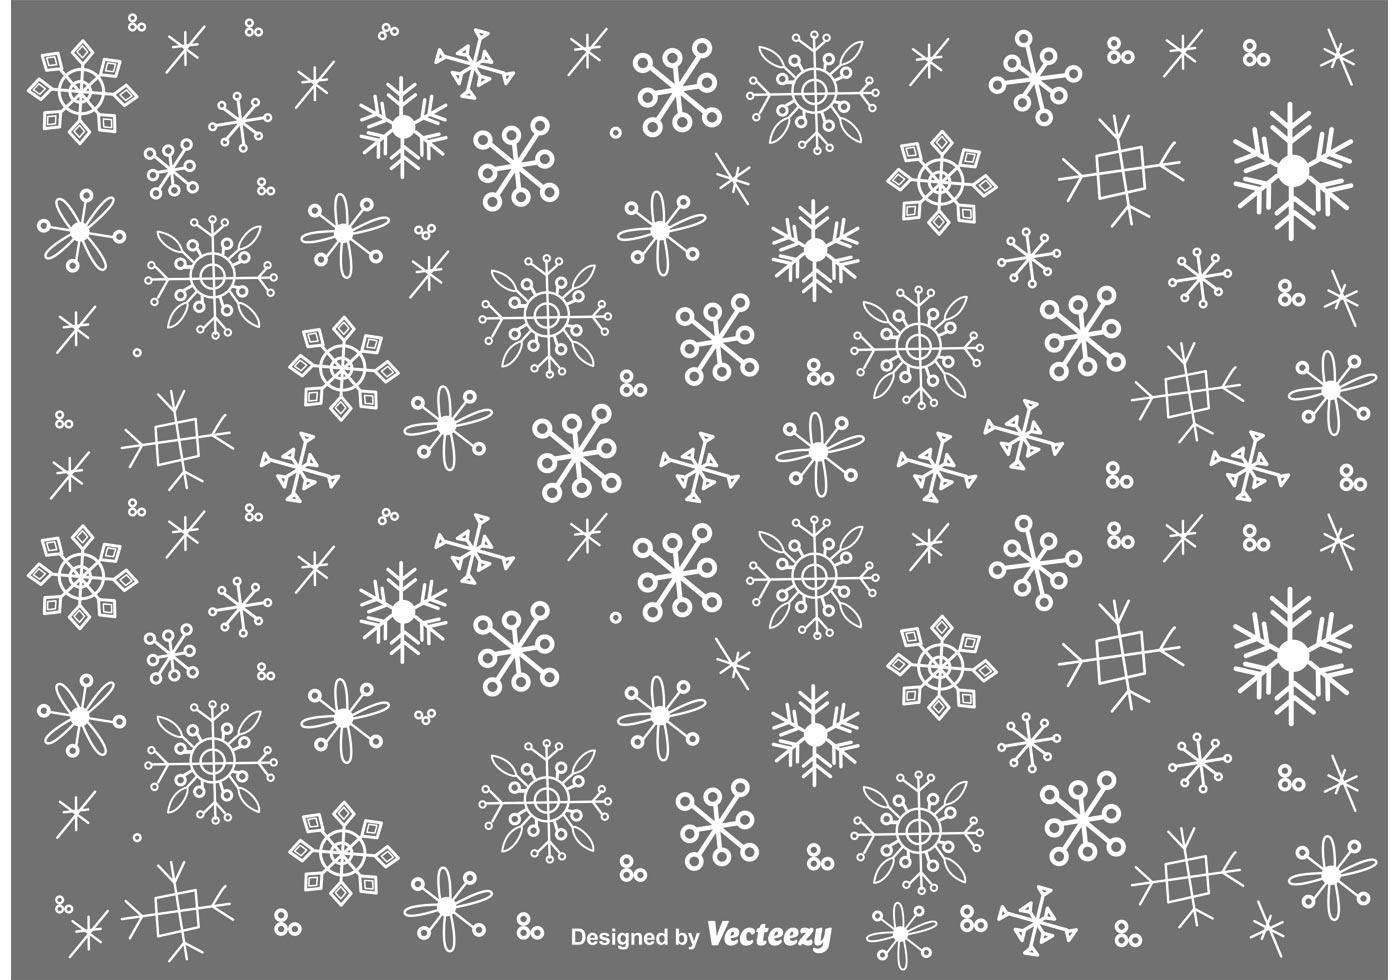 Snow Falling Background Wallpaper Snow Flakes Doodles Vector Set Download Free Vector Art